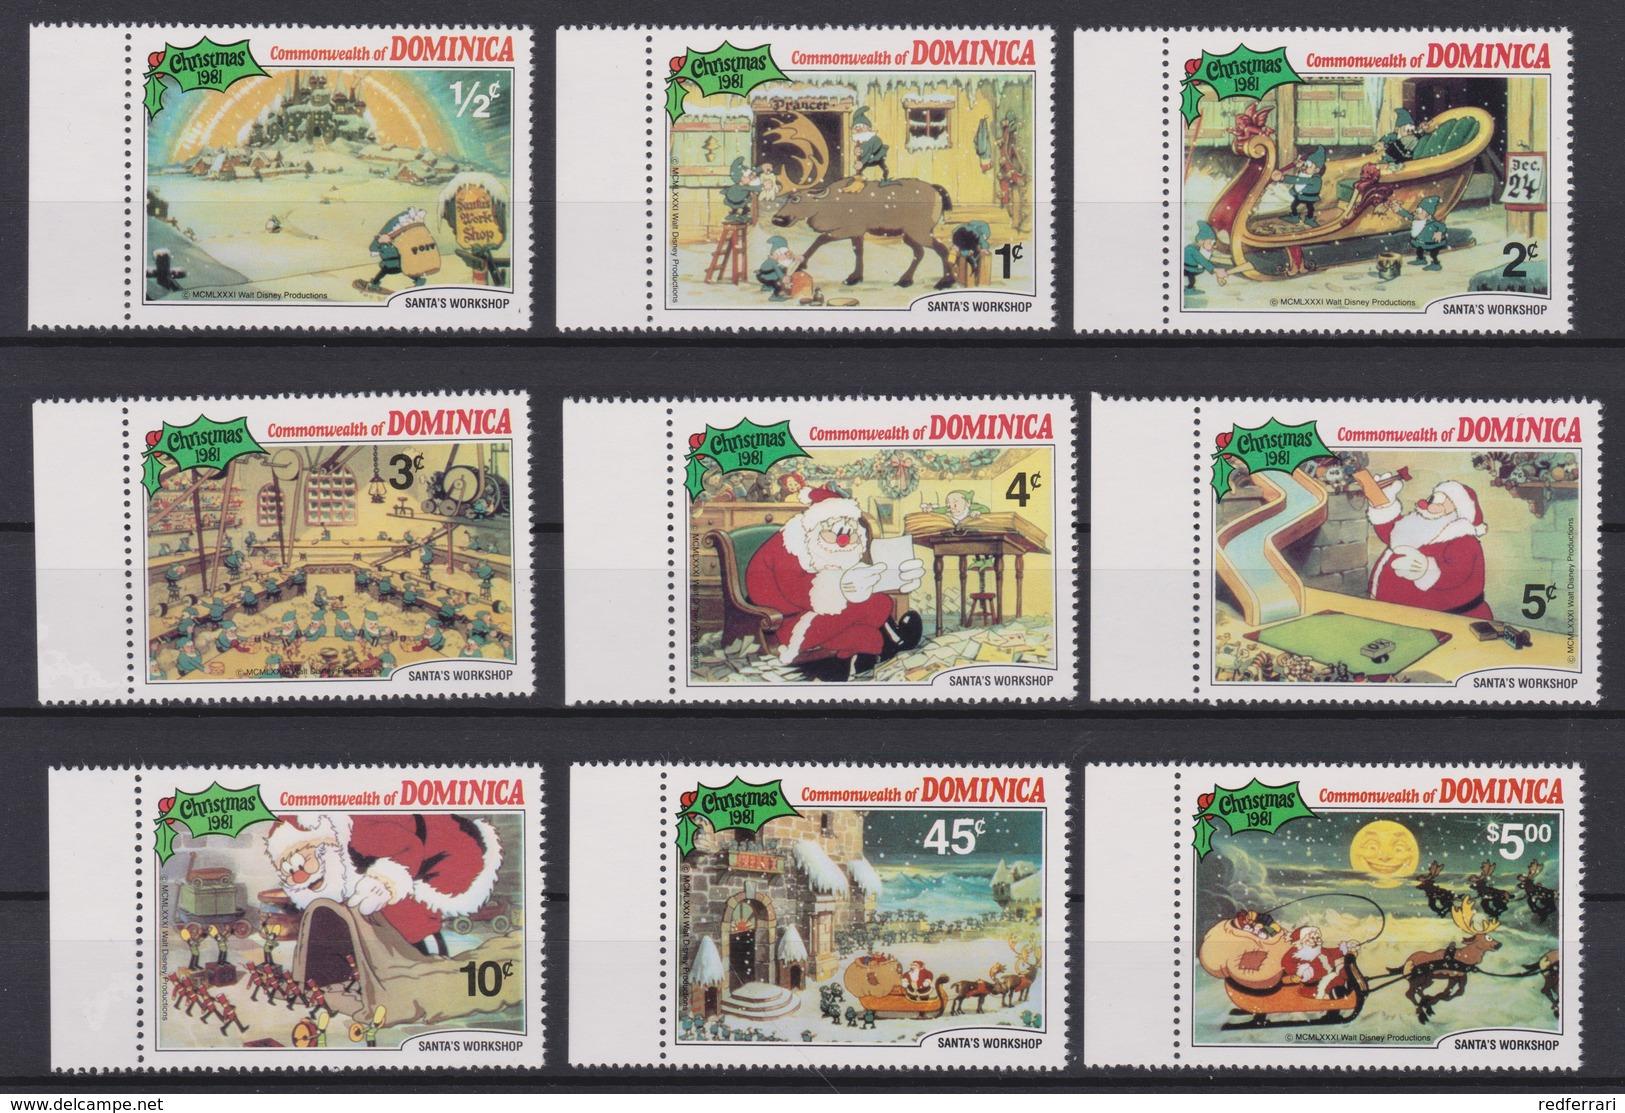 2142  WALT DISNEY - Commonwealth Of   DOMINICA  ( CHRISTMAS 1981 )  SANTA'S WORKSHOP . - Disney